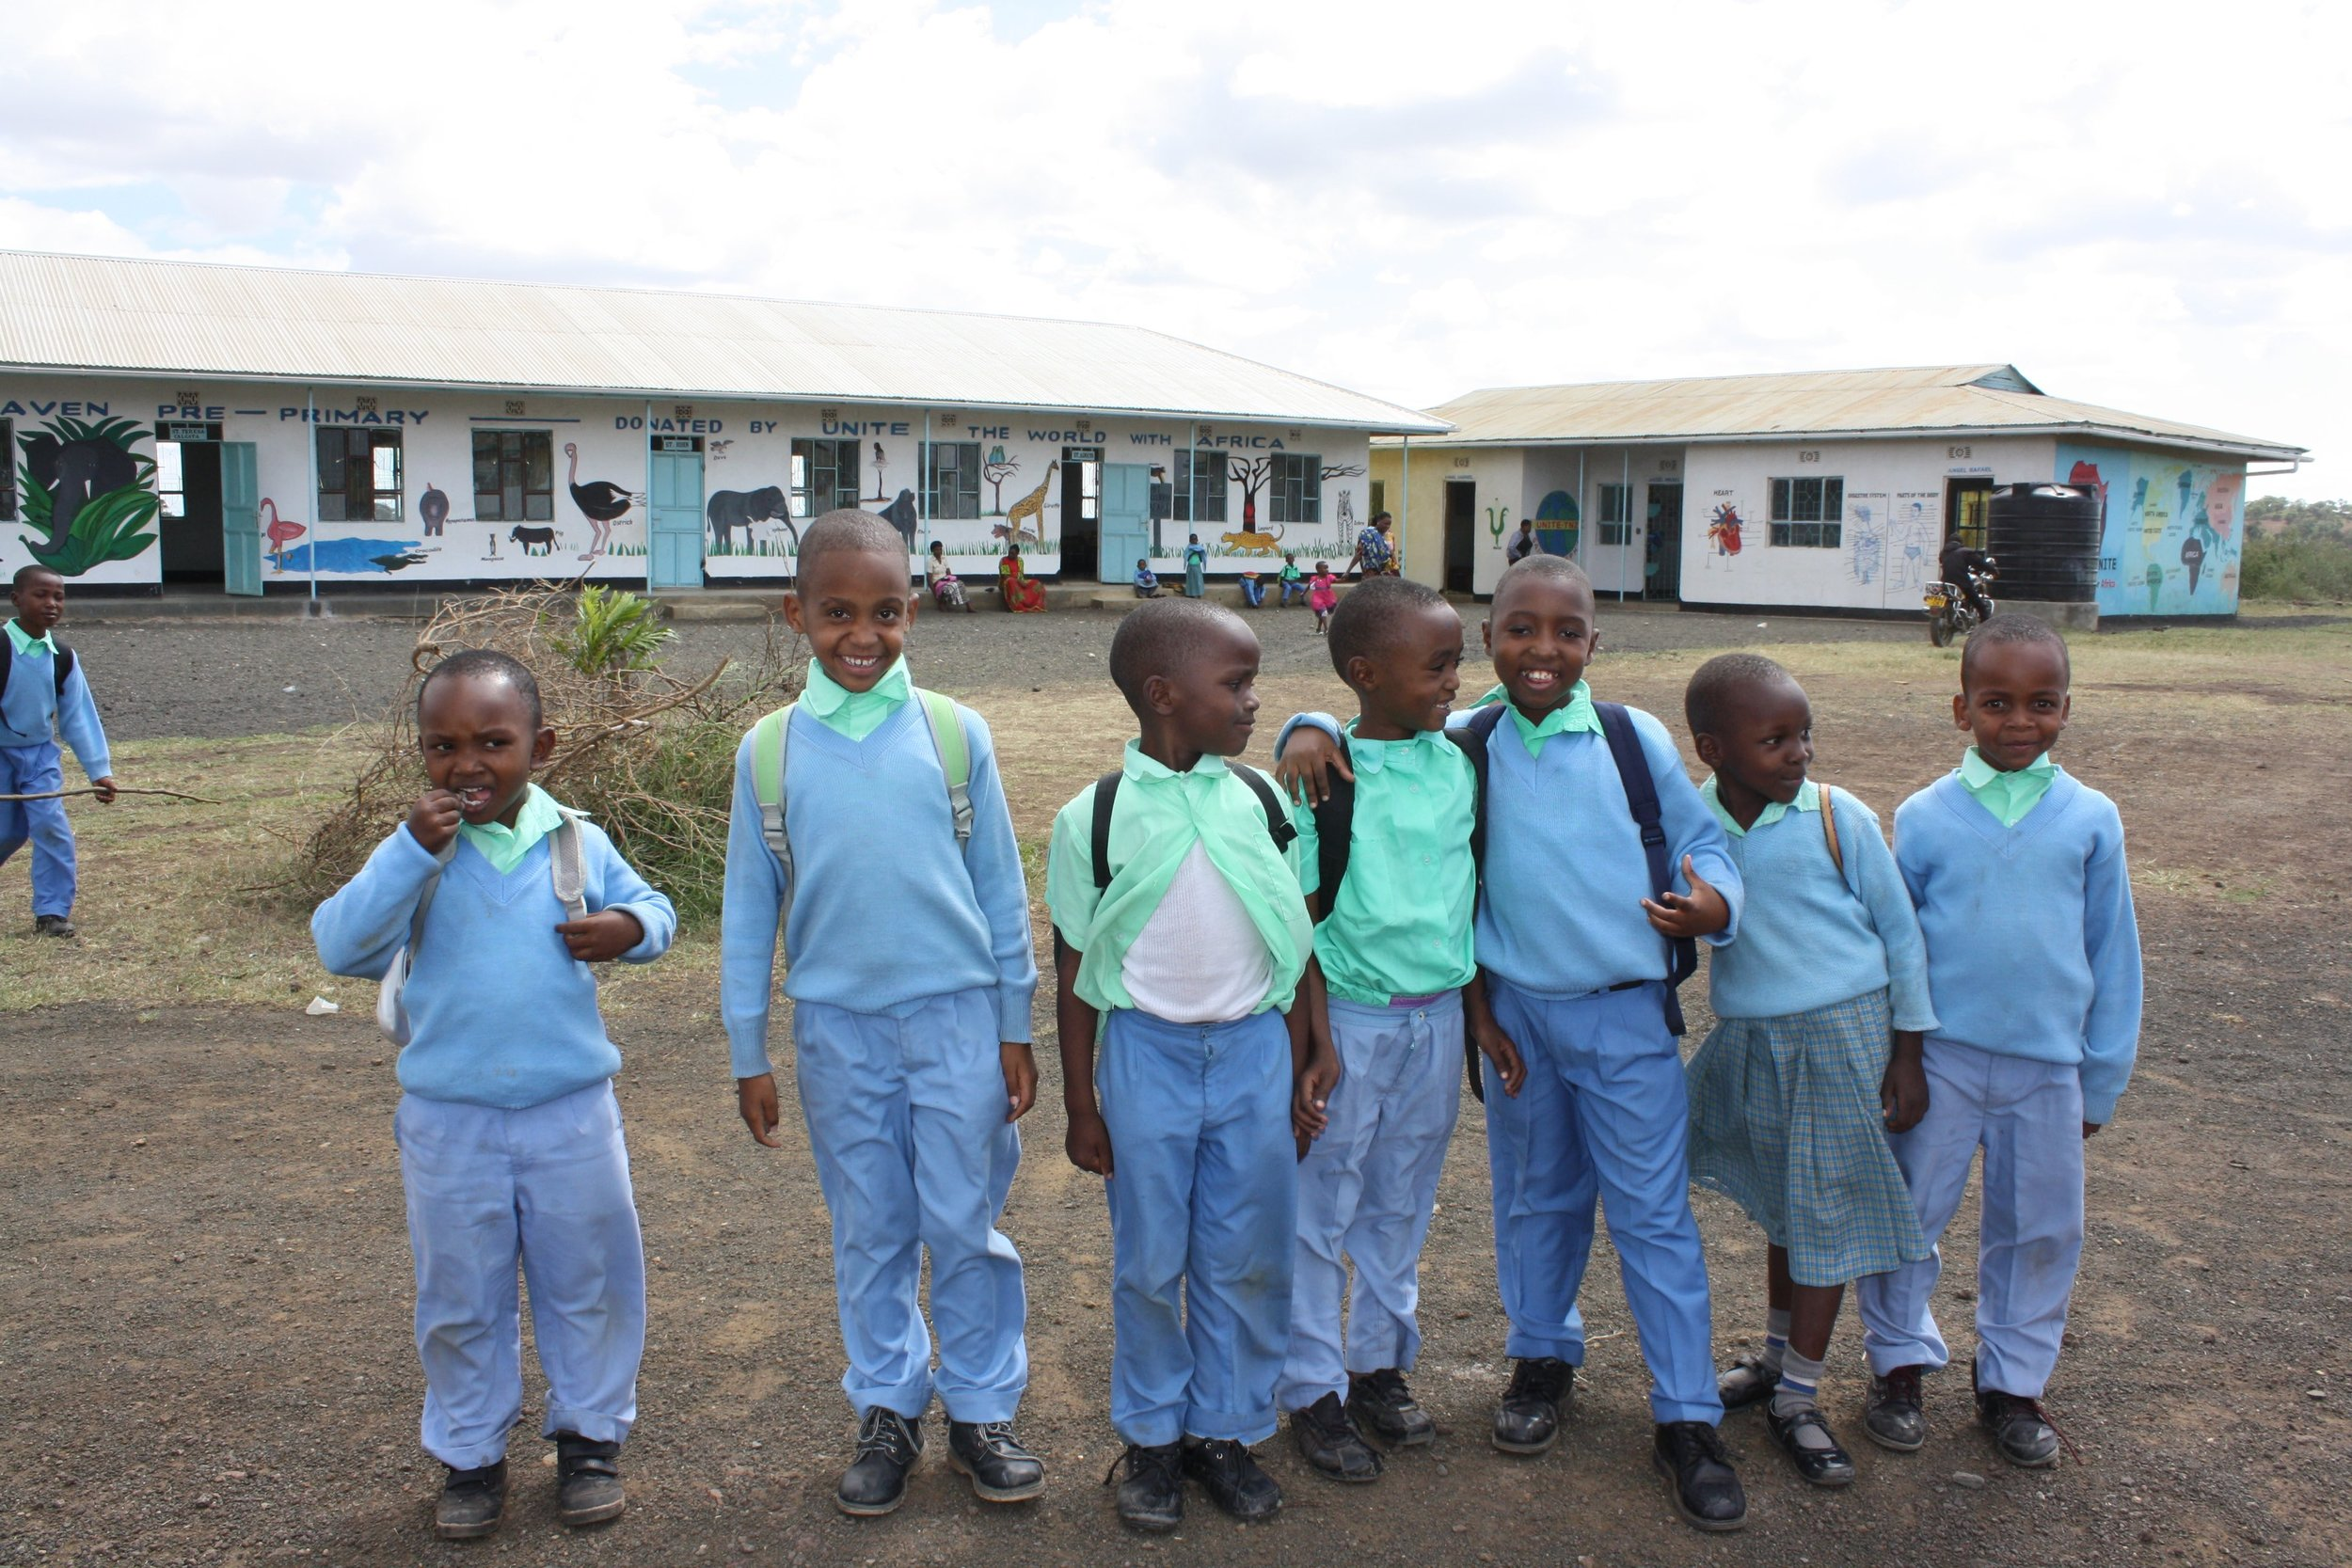 heaven kids in front of school.jpg